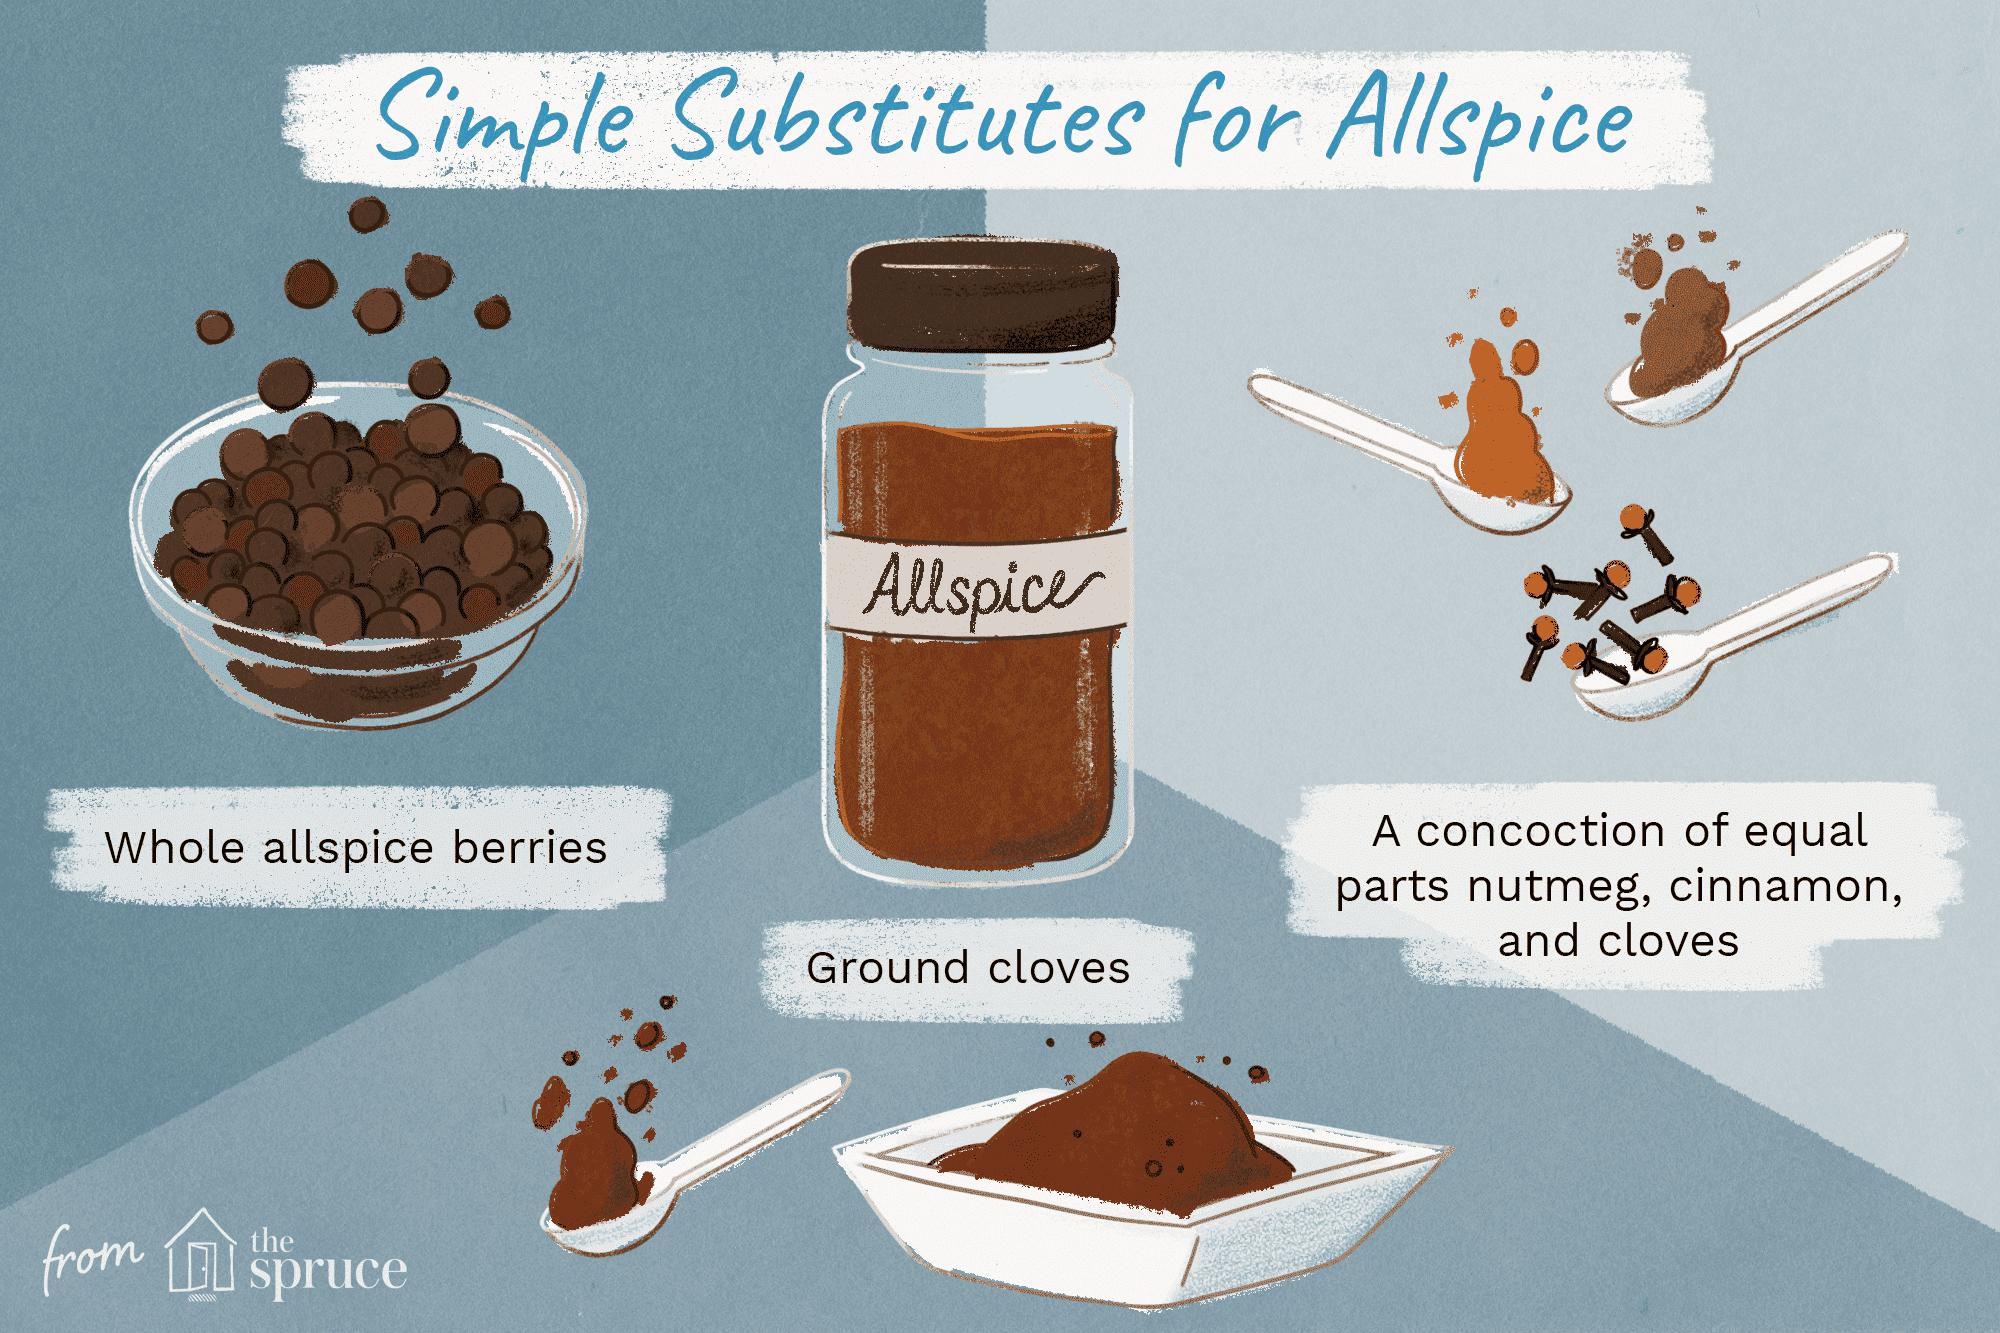 Allspice substitution